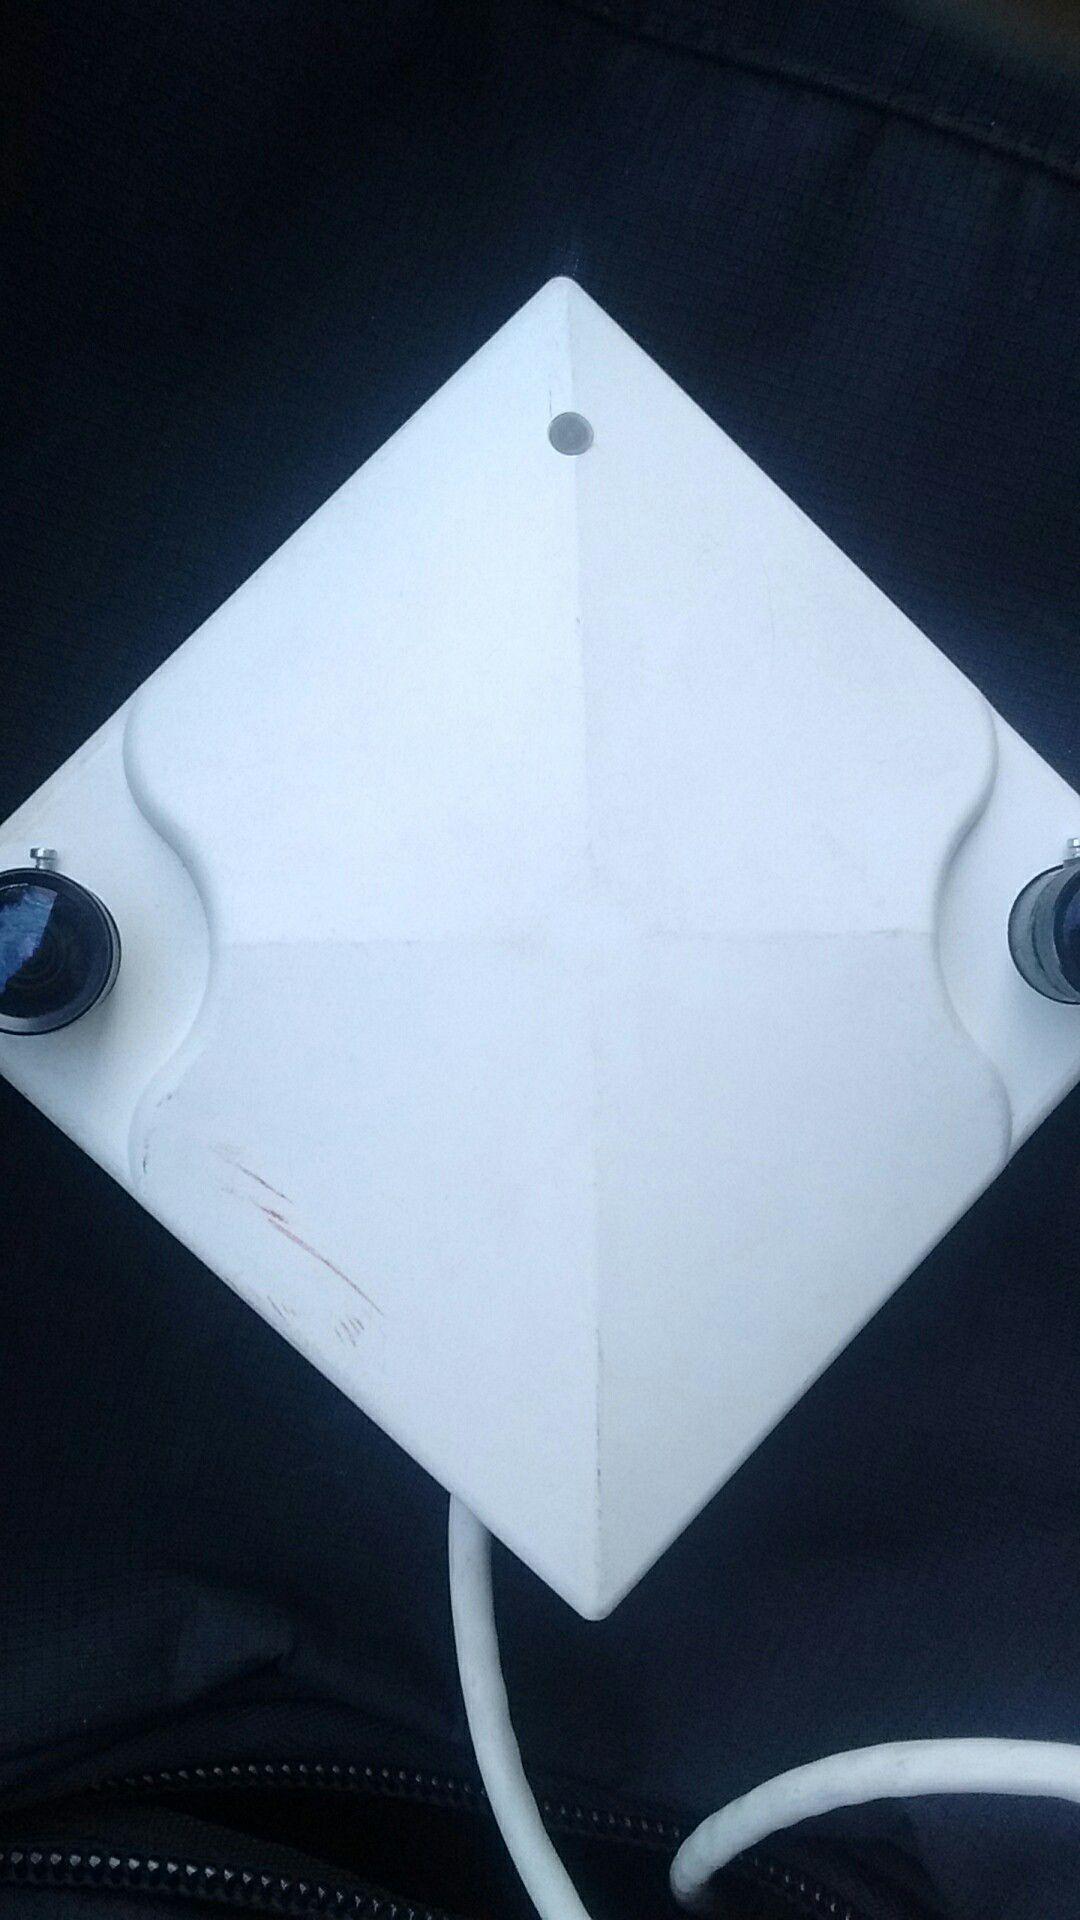 Ganz Surveillance camera's